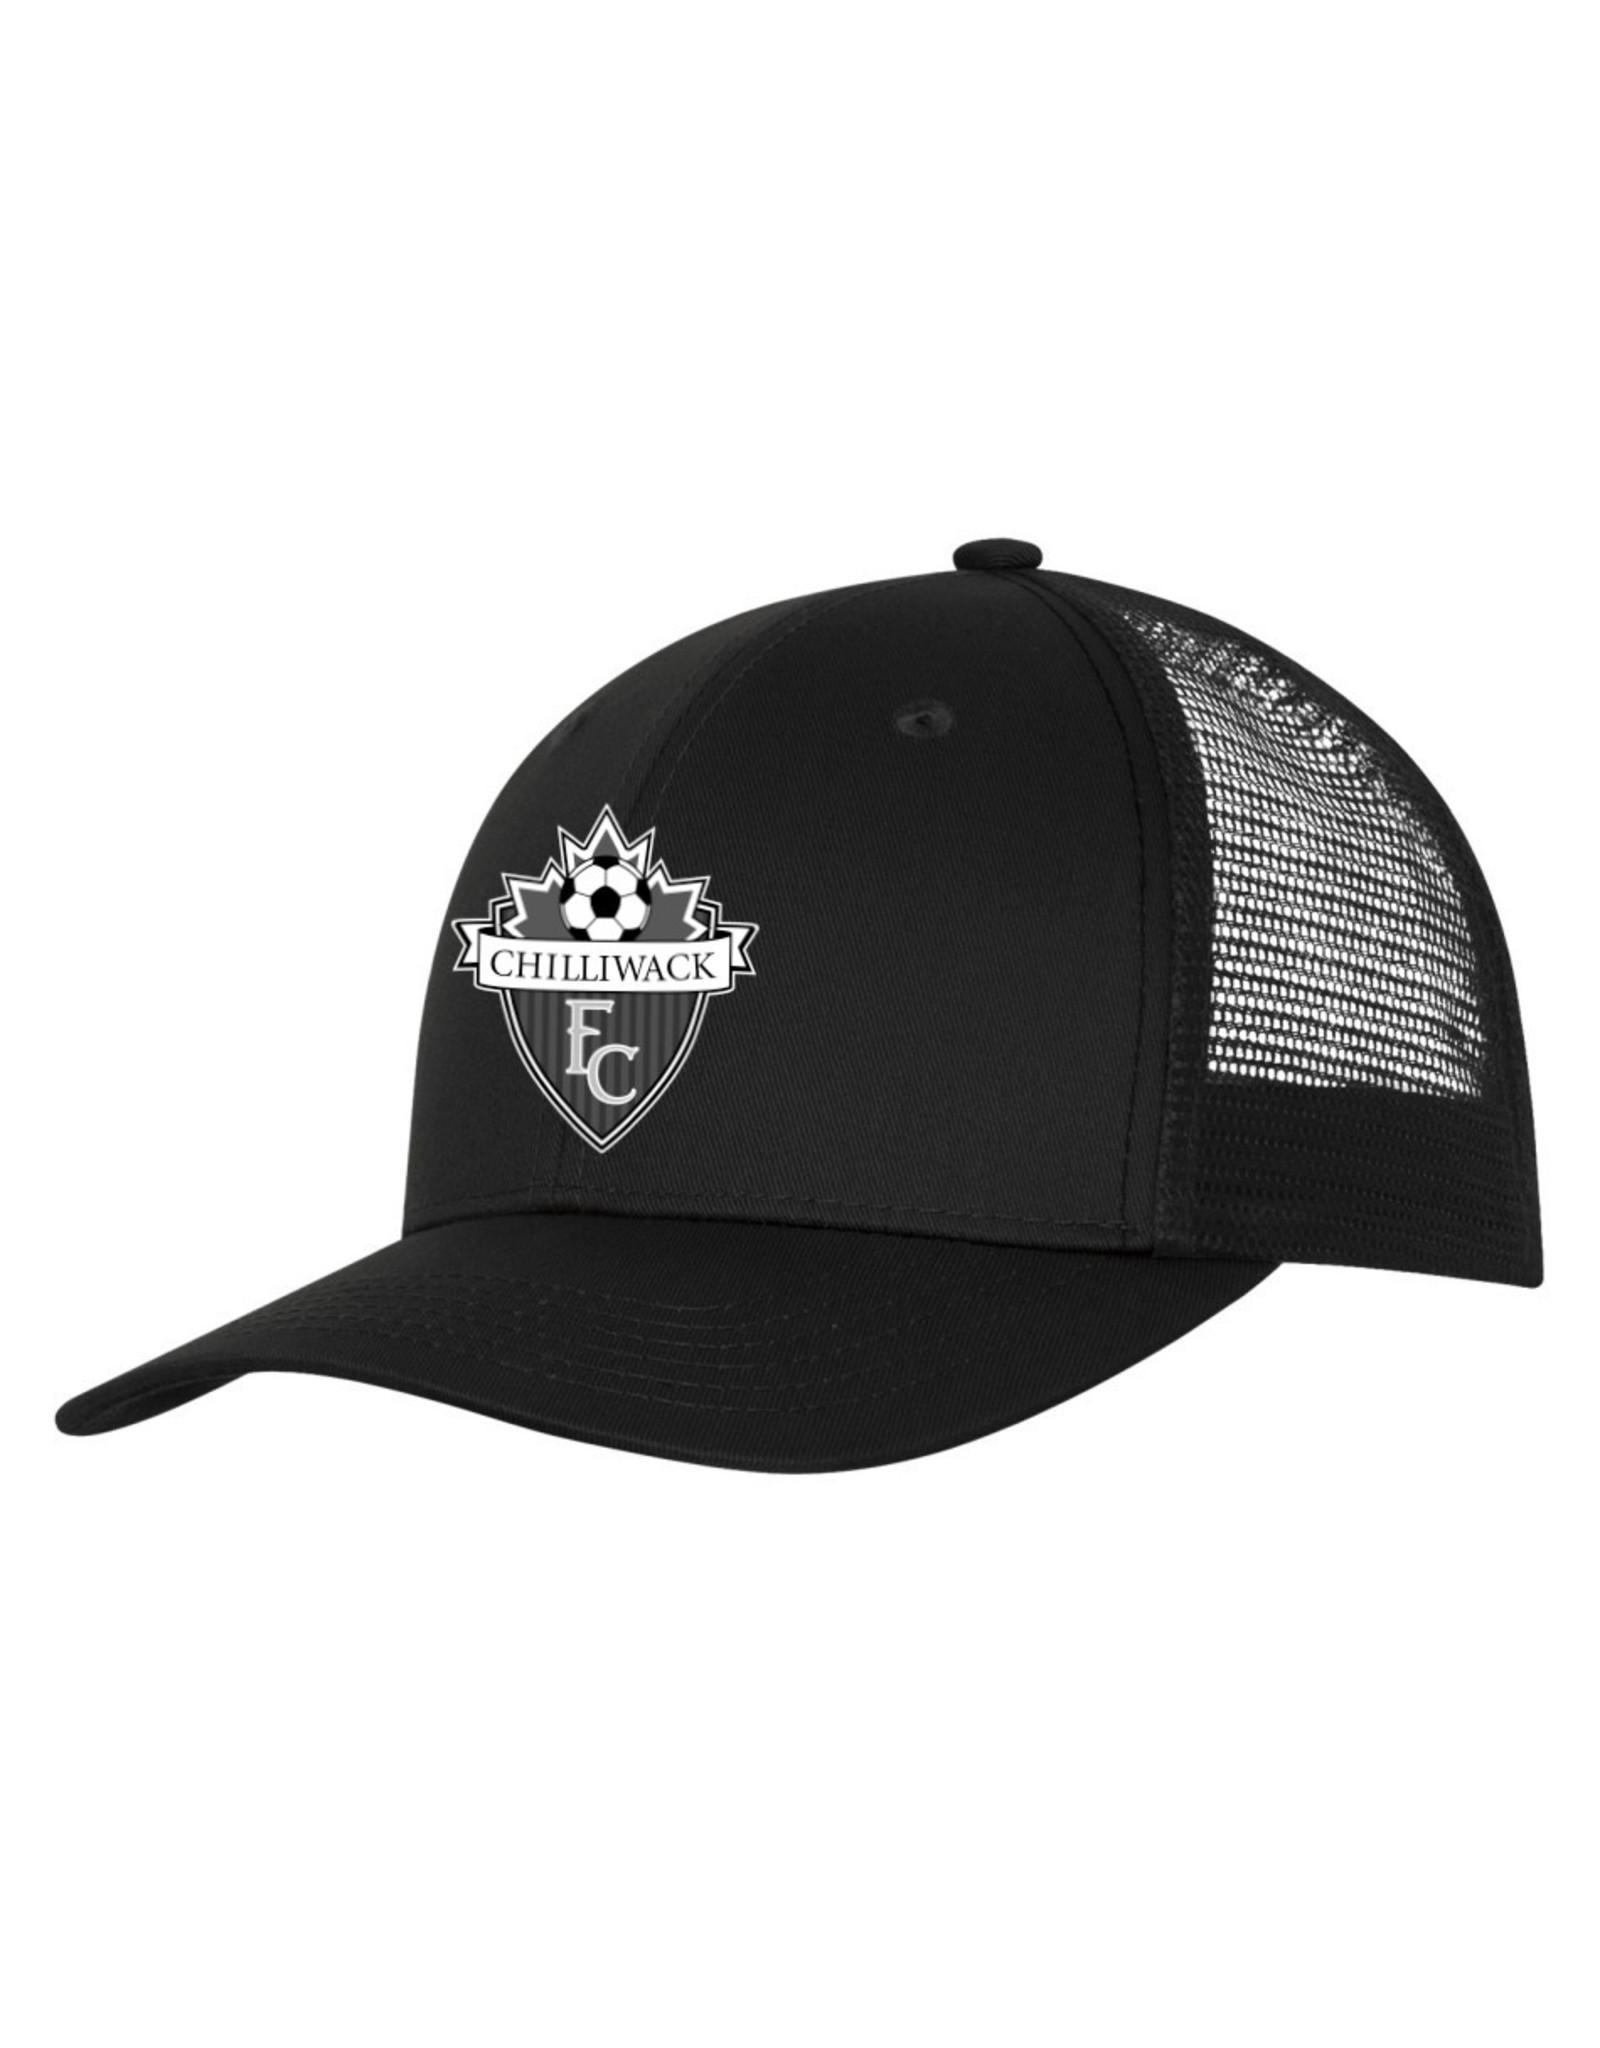 New Era CHILLIWACK FC BLACK SNAPBACK HAT